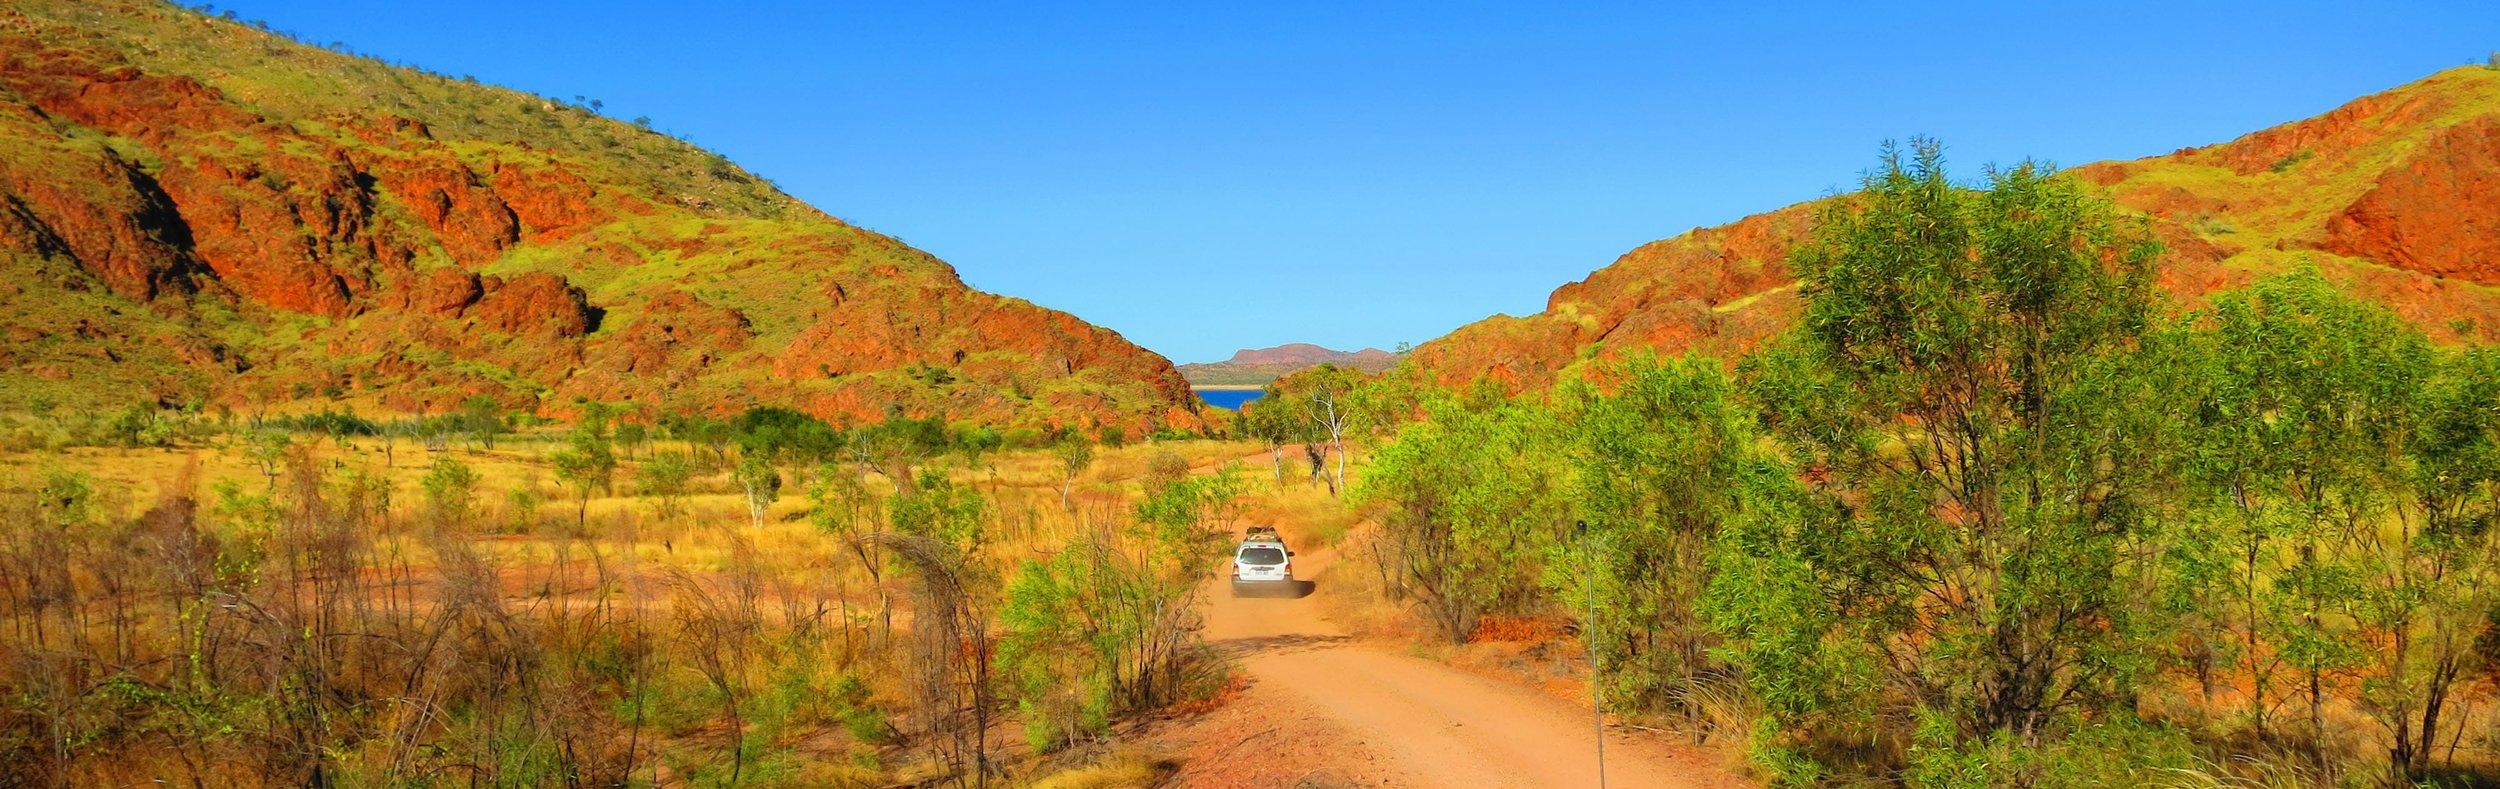 mt mansbridge - Western Australia (100%* Volcanic)